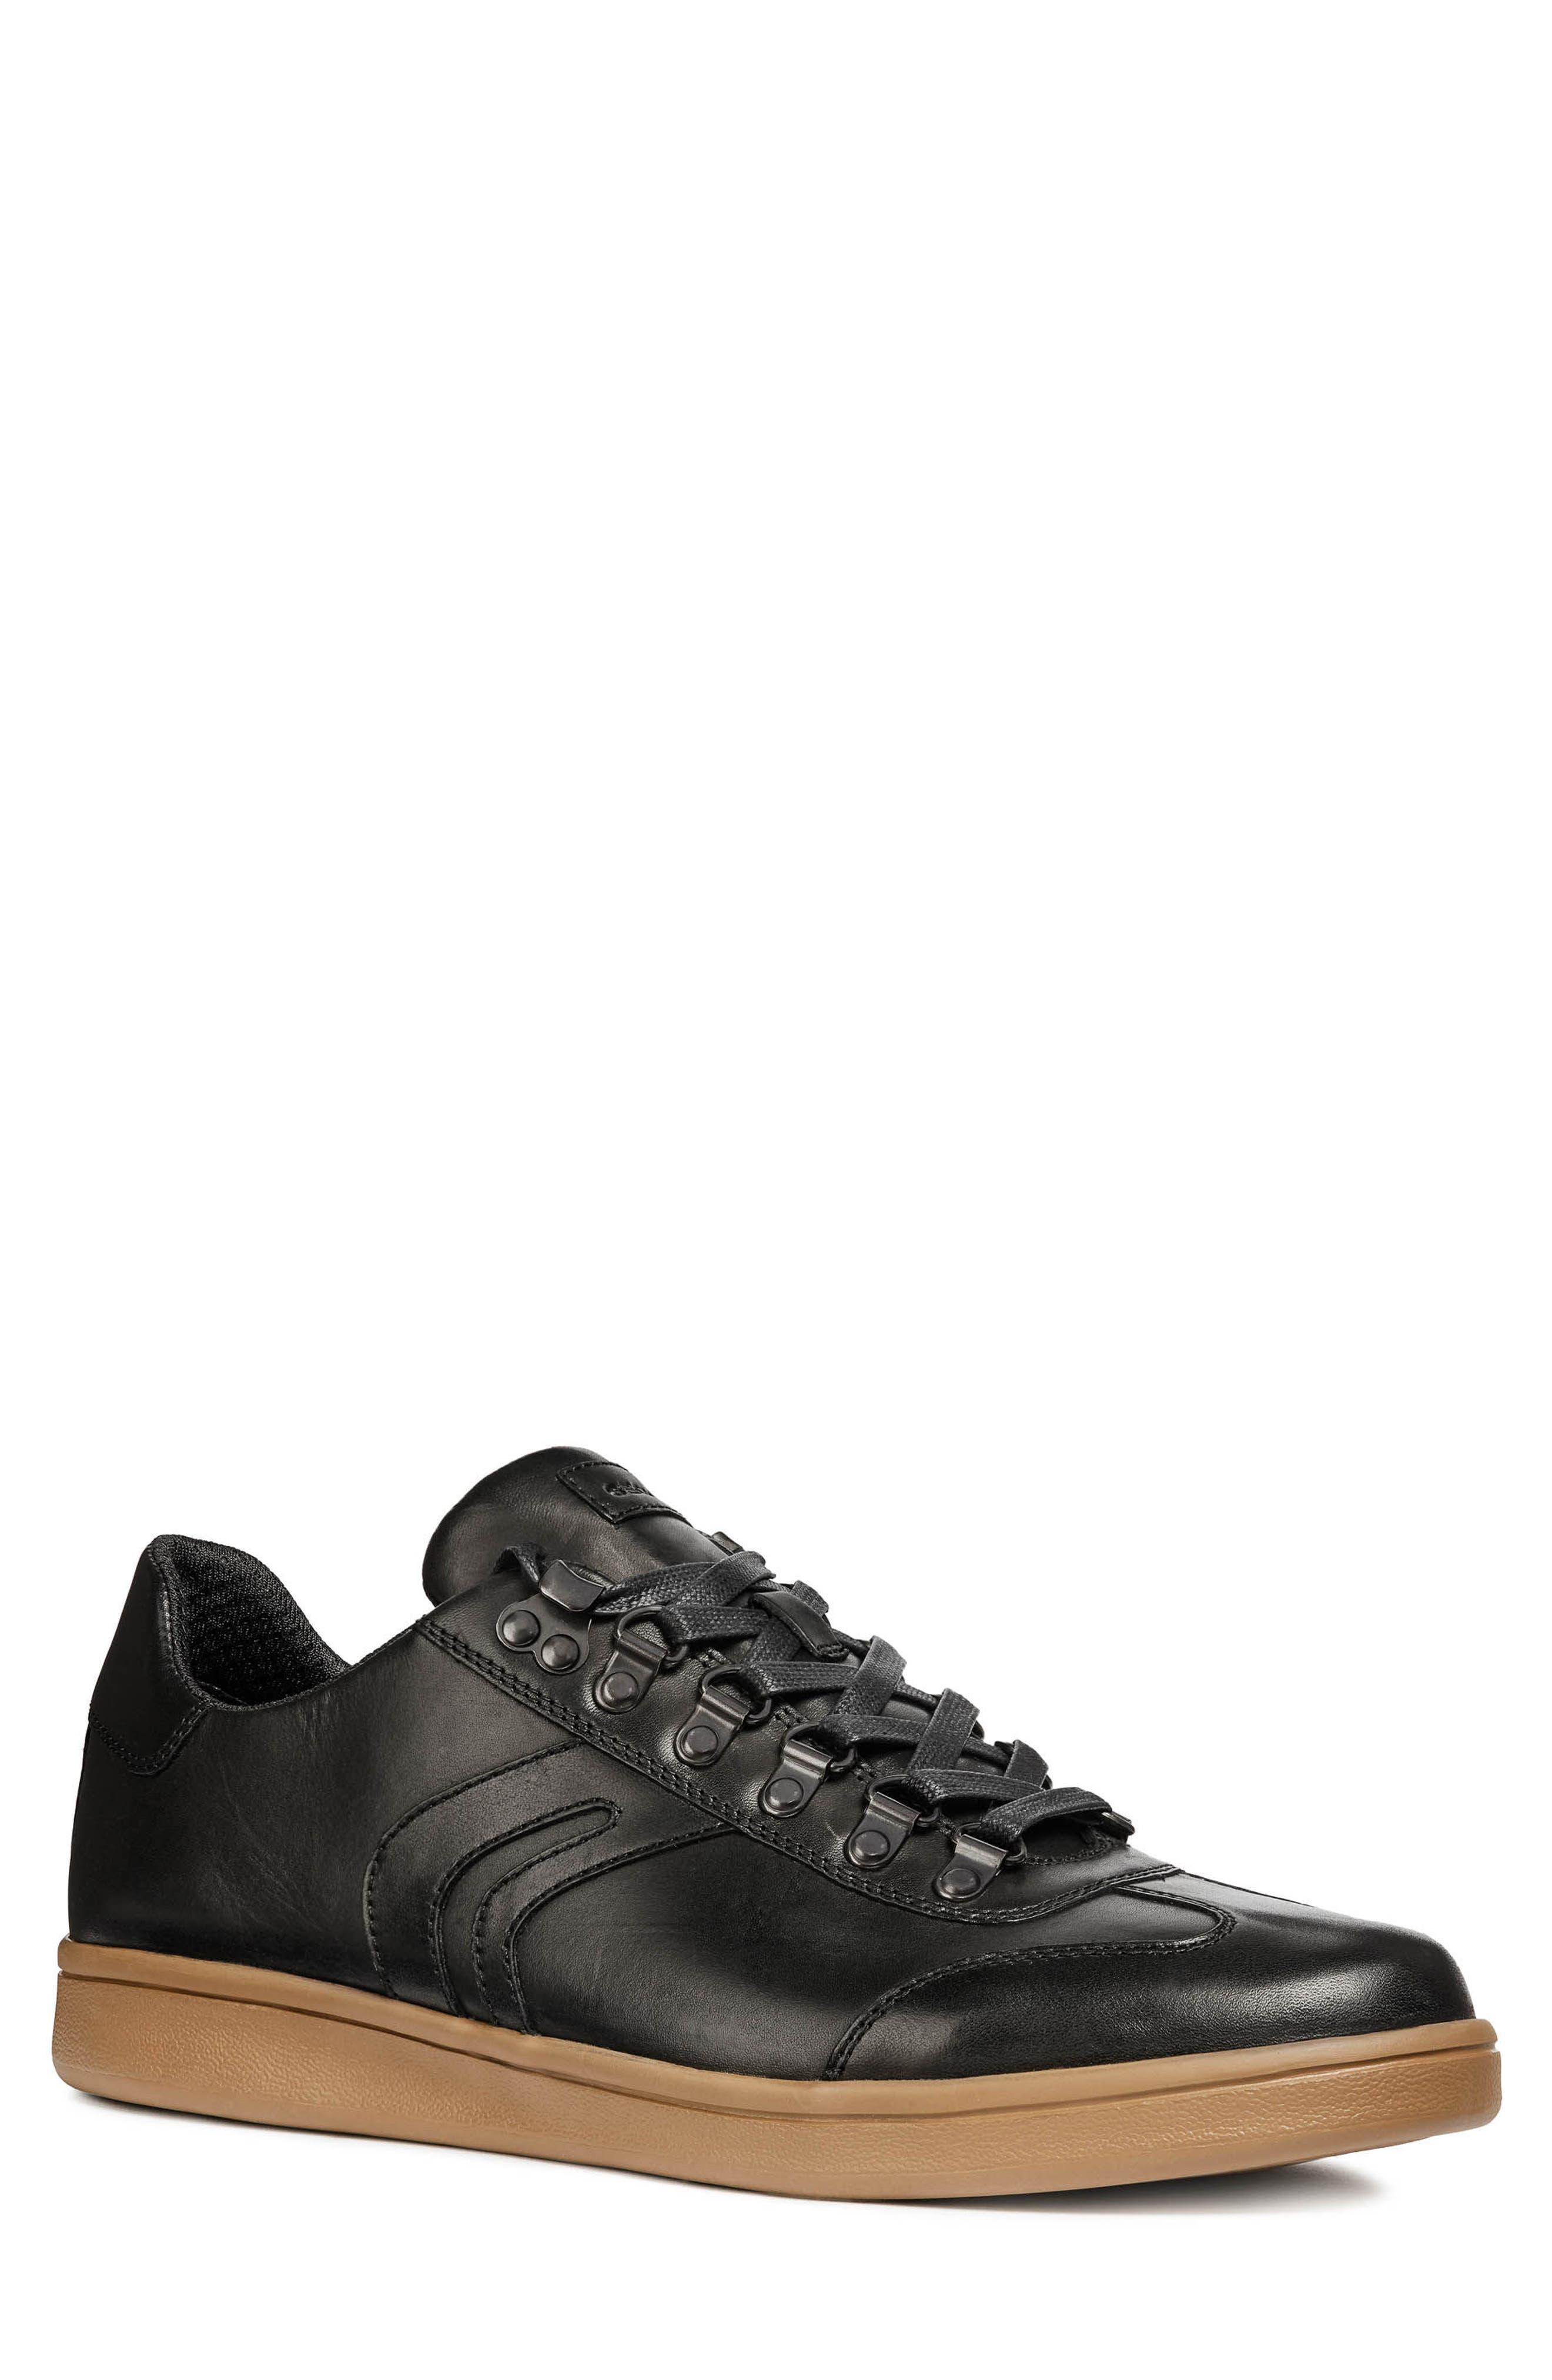 Warrens 12 Low Top Sneaker,                         Main,                         color, BLACK LEATHER